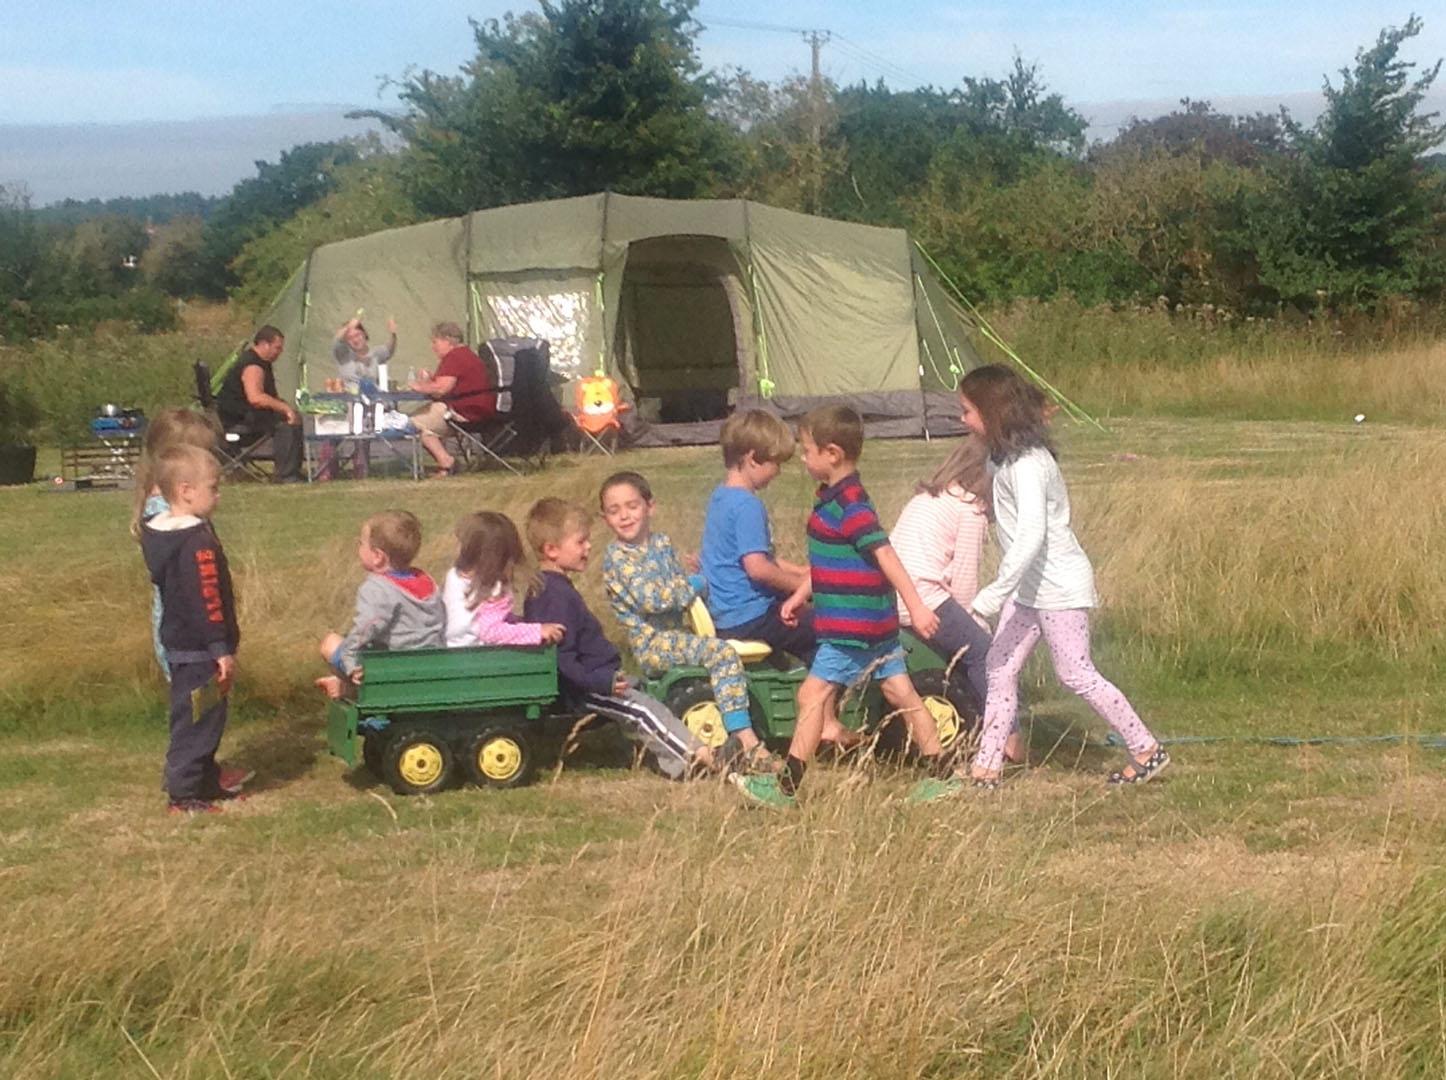 Dot's Camping